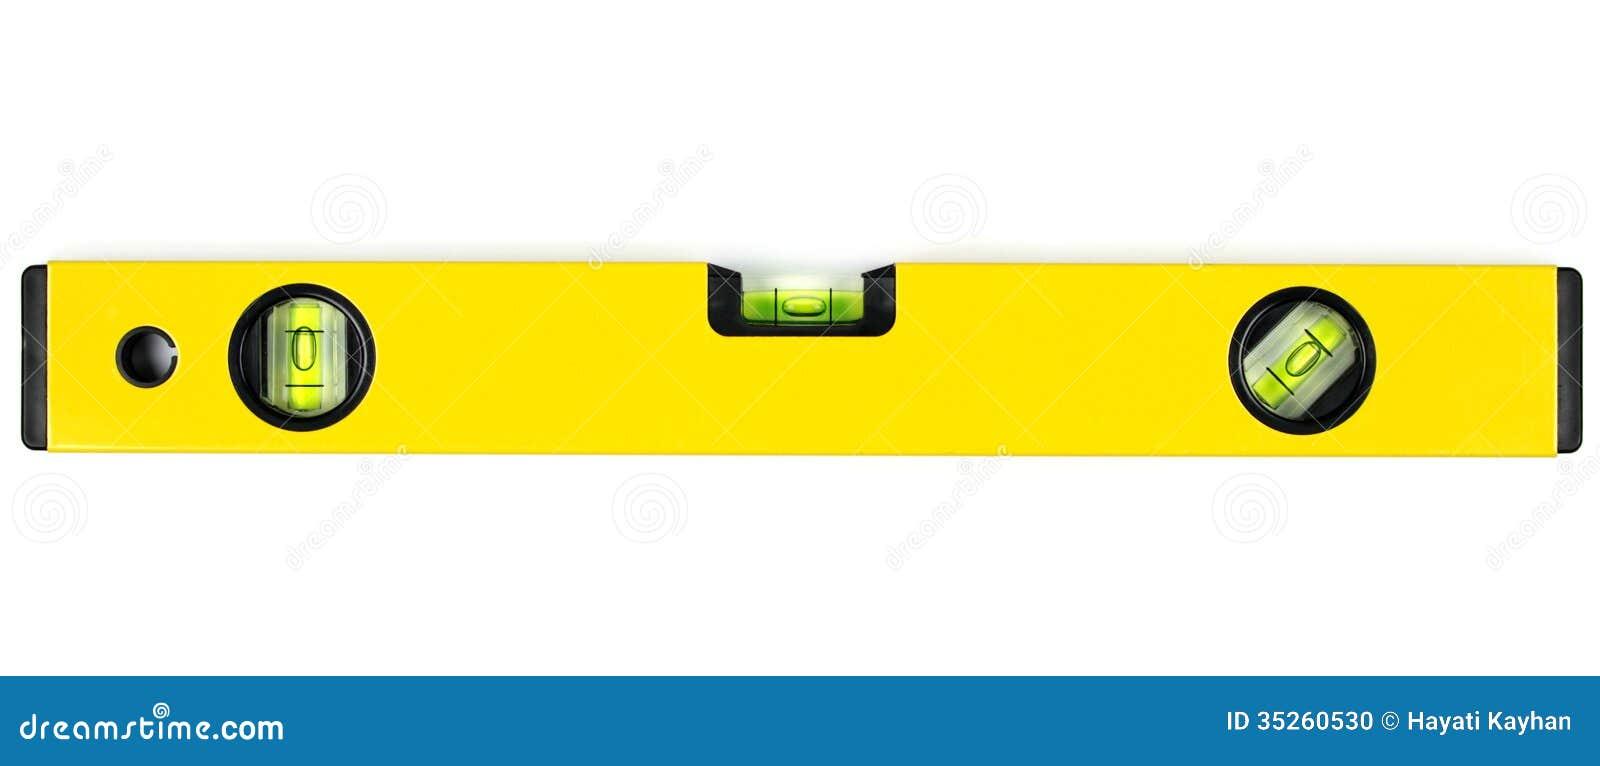 Yellow spirit level stock photo image of engineering 35260530 yellow spirit level pooptronica